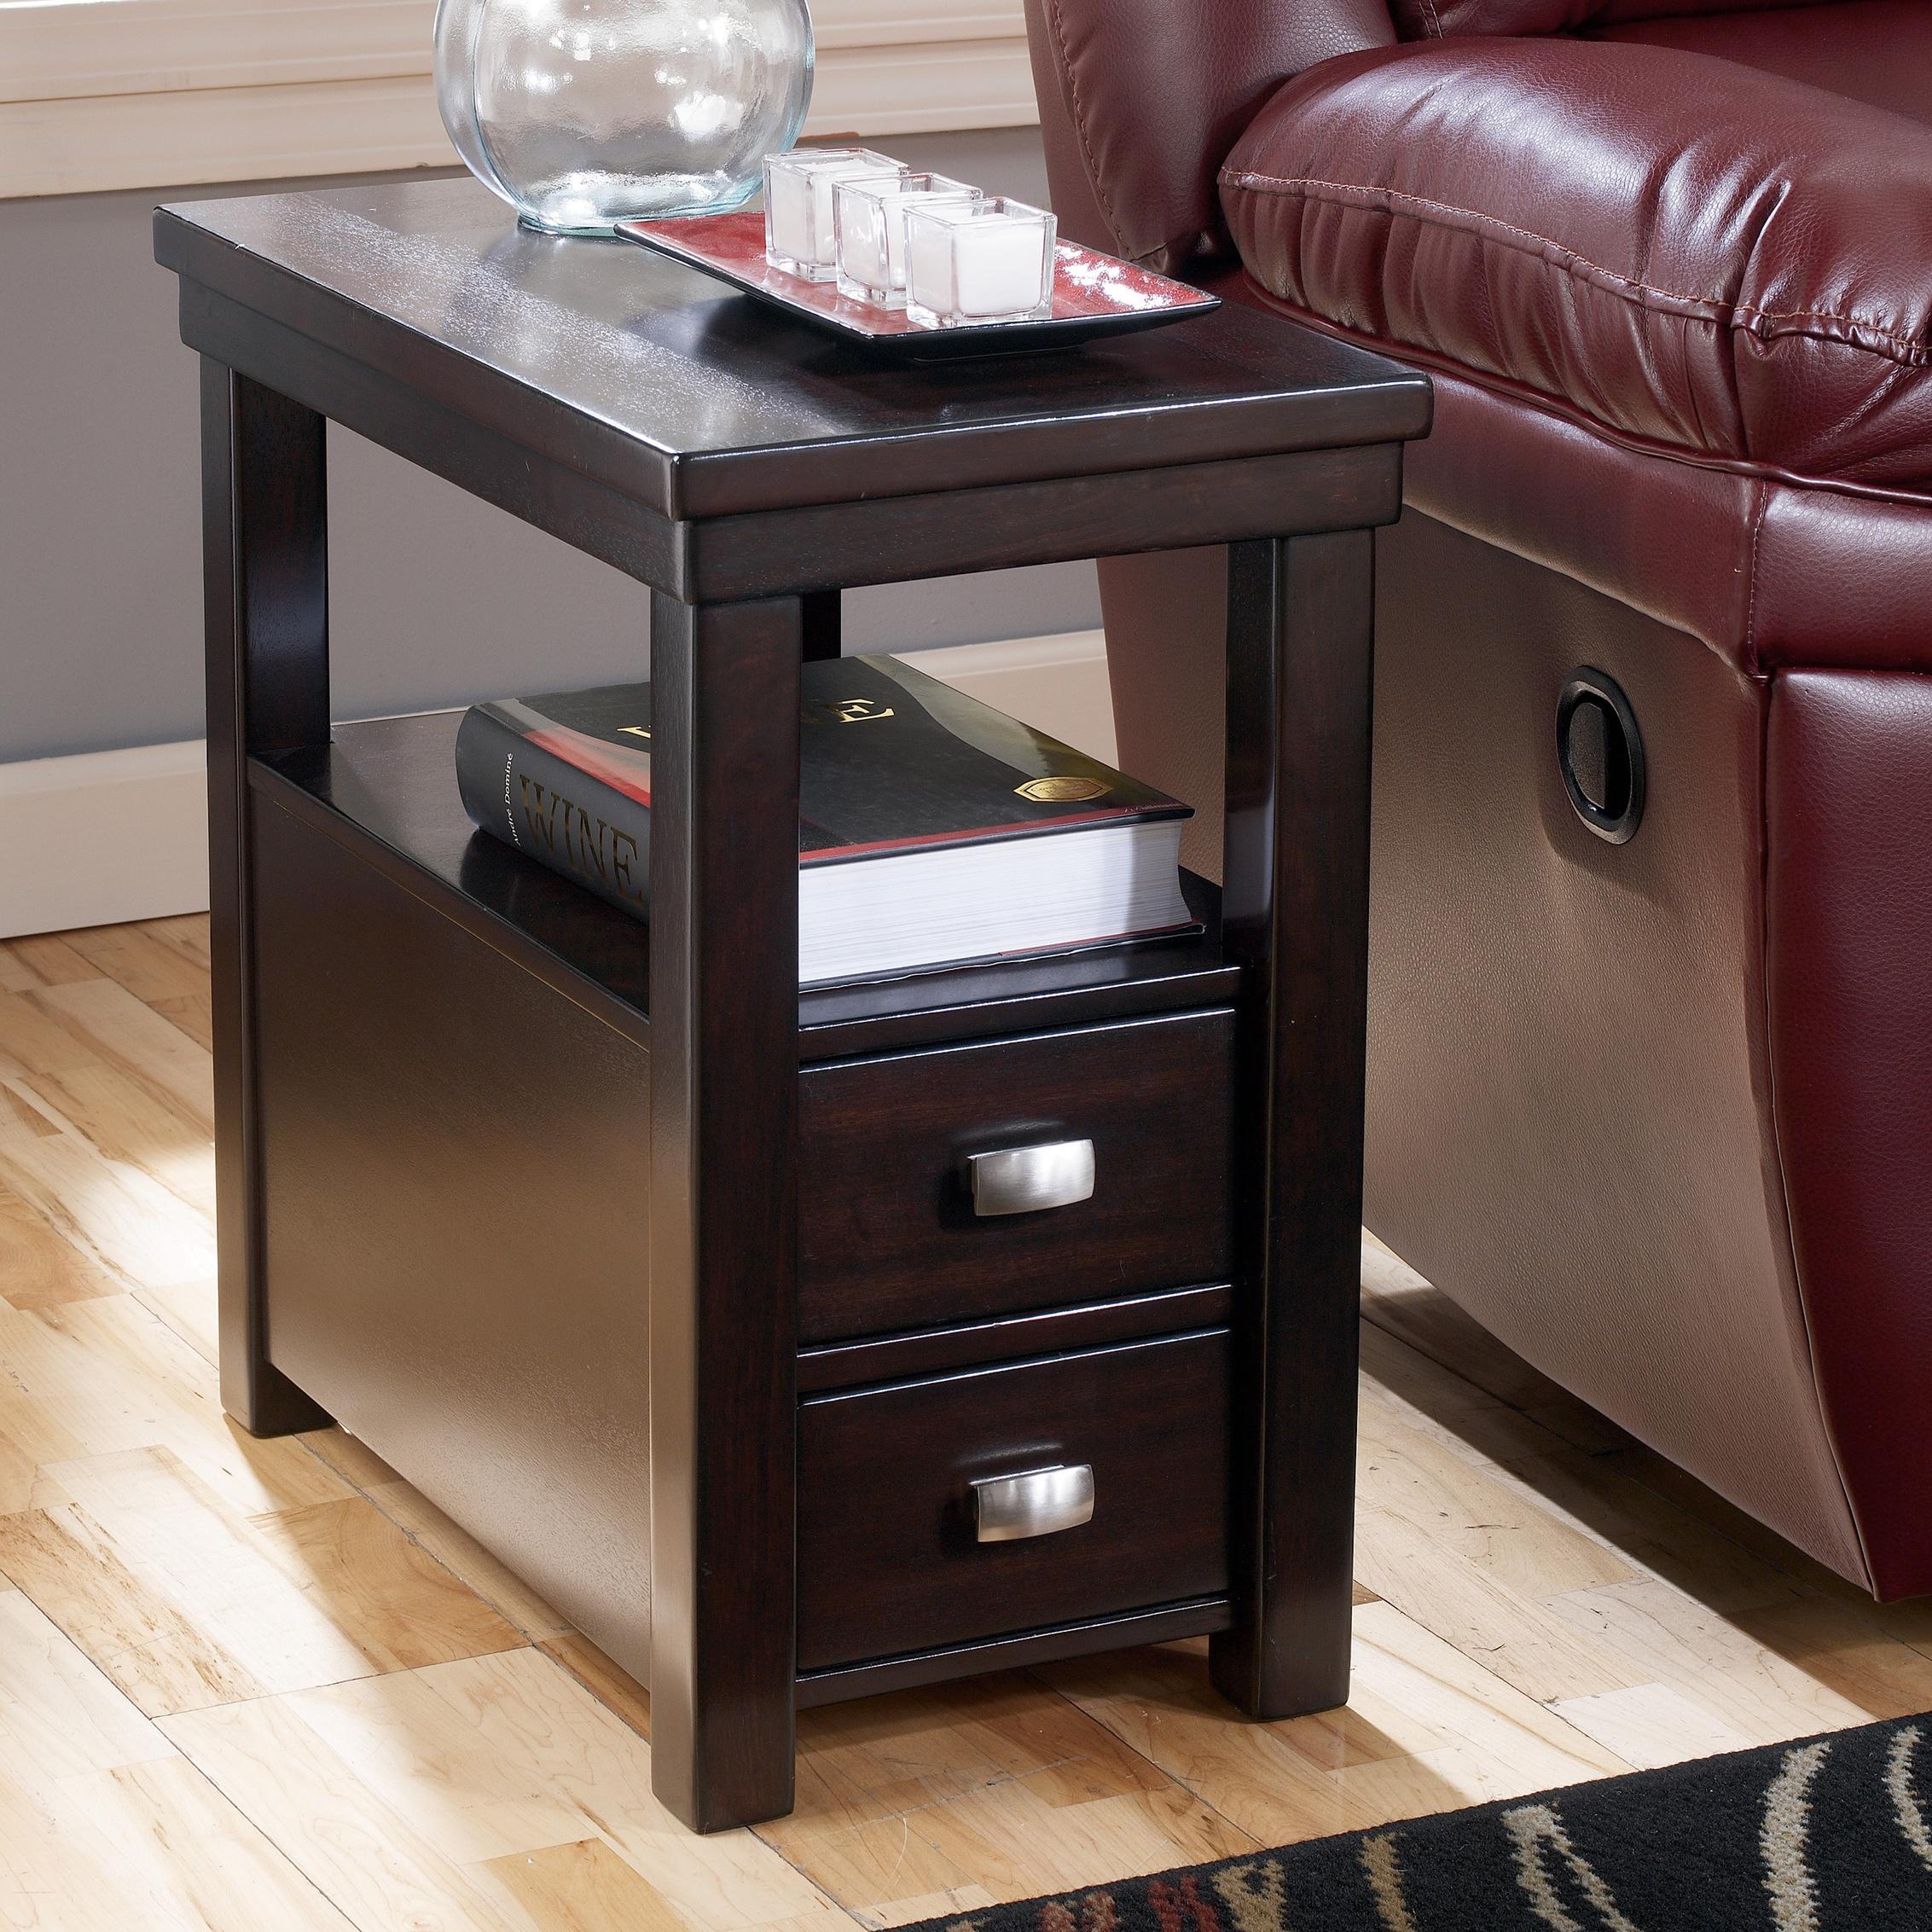 Ashley Furniture at Godby Home Furnishings